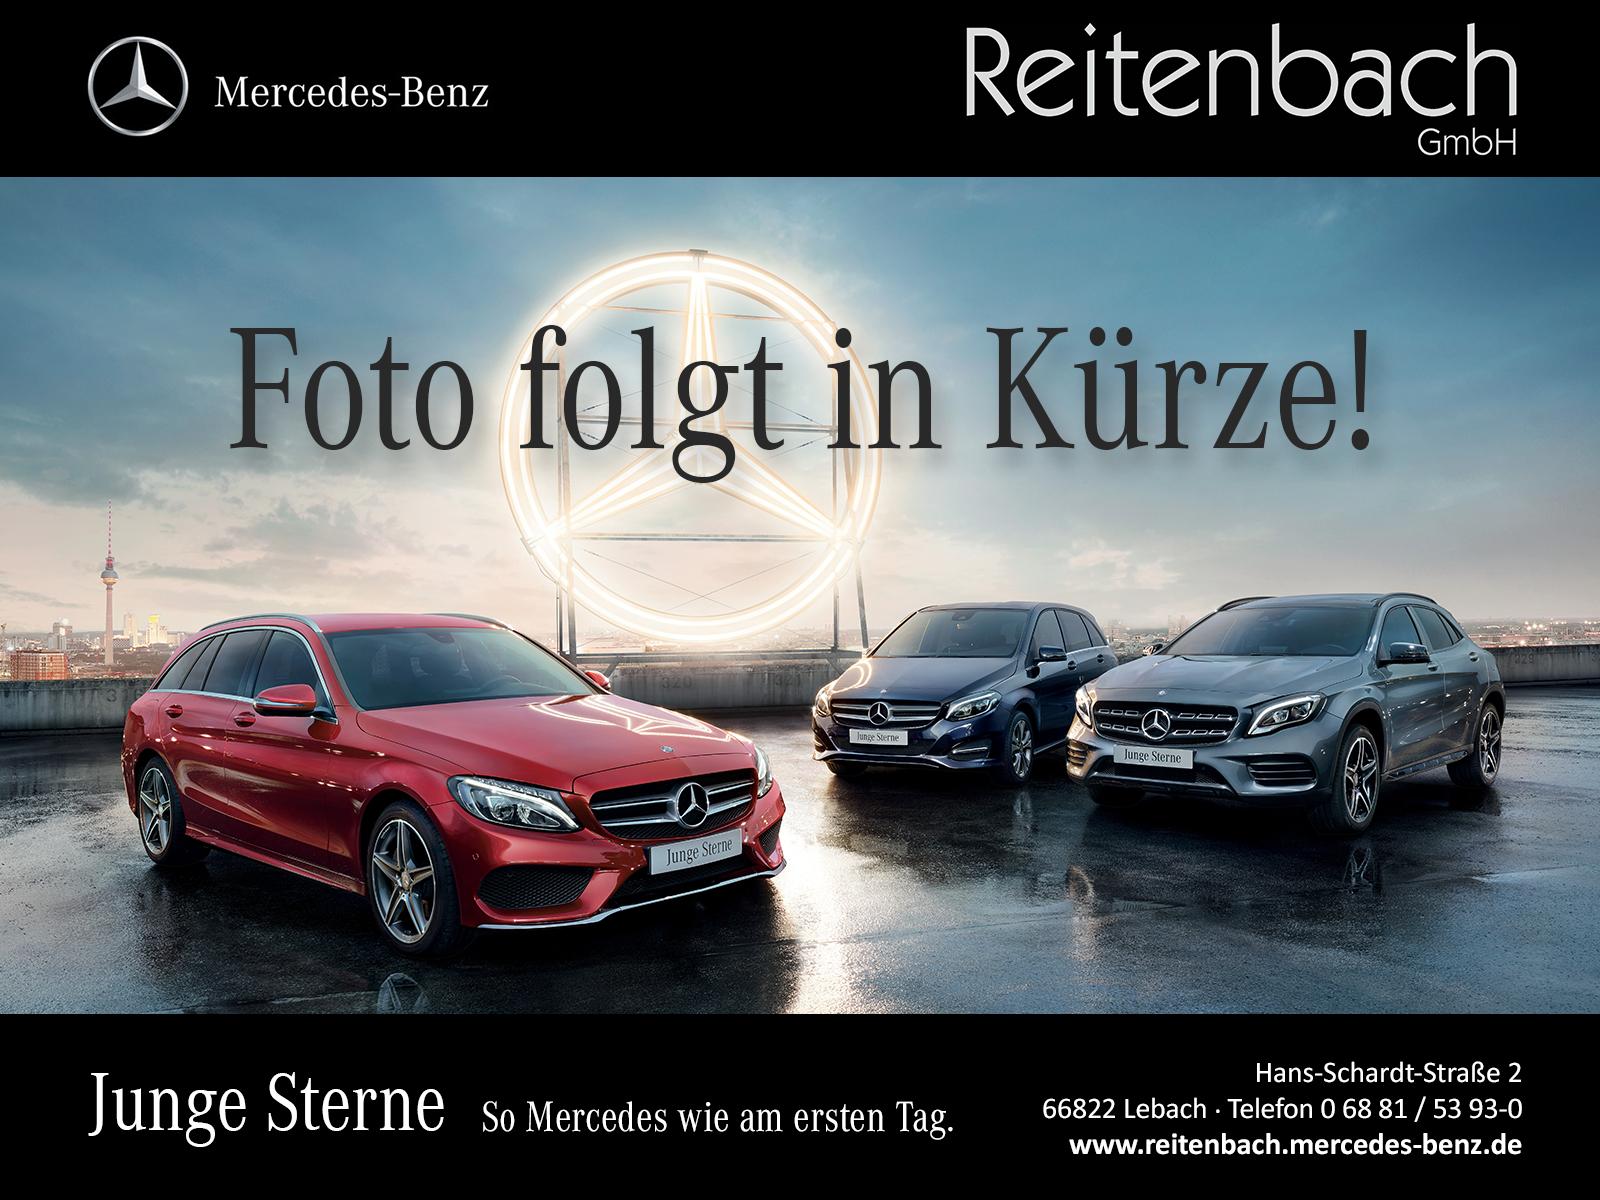 Mercedes-Benz Mercedes-AMG GT43 4M+SHD+BURME+KAMERA +AMGABGAS, Jahr 2019, Benzin